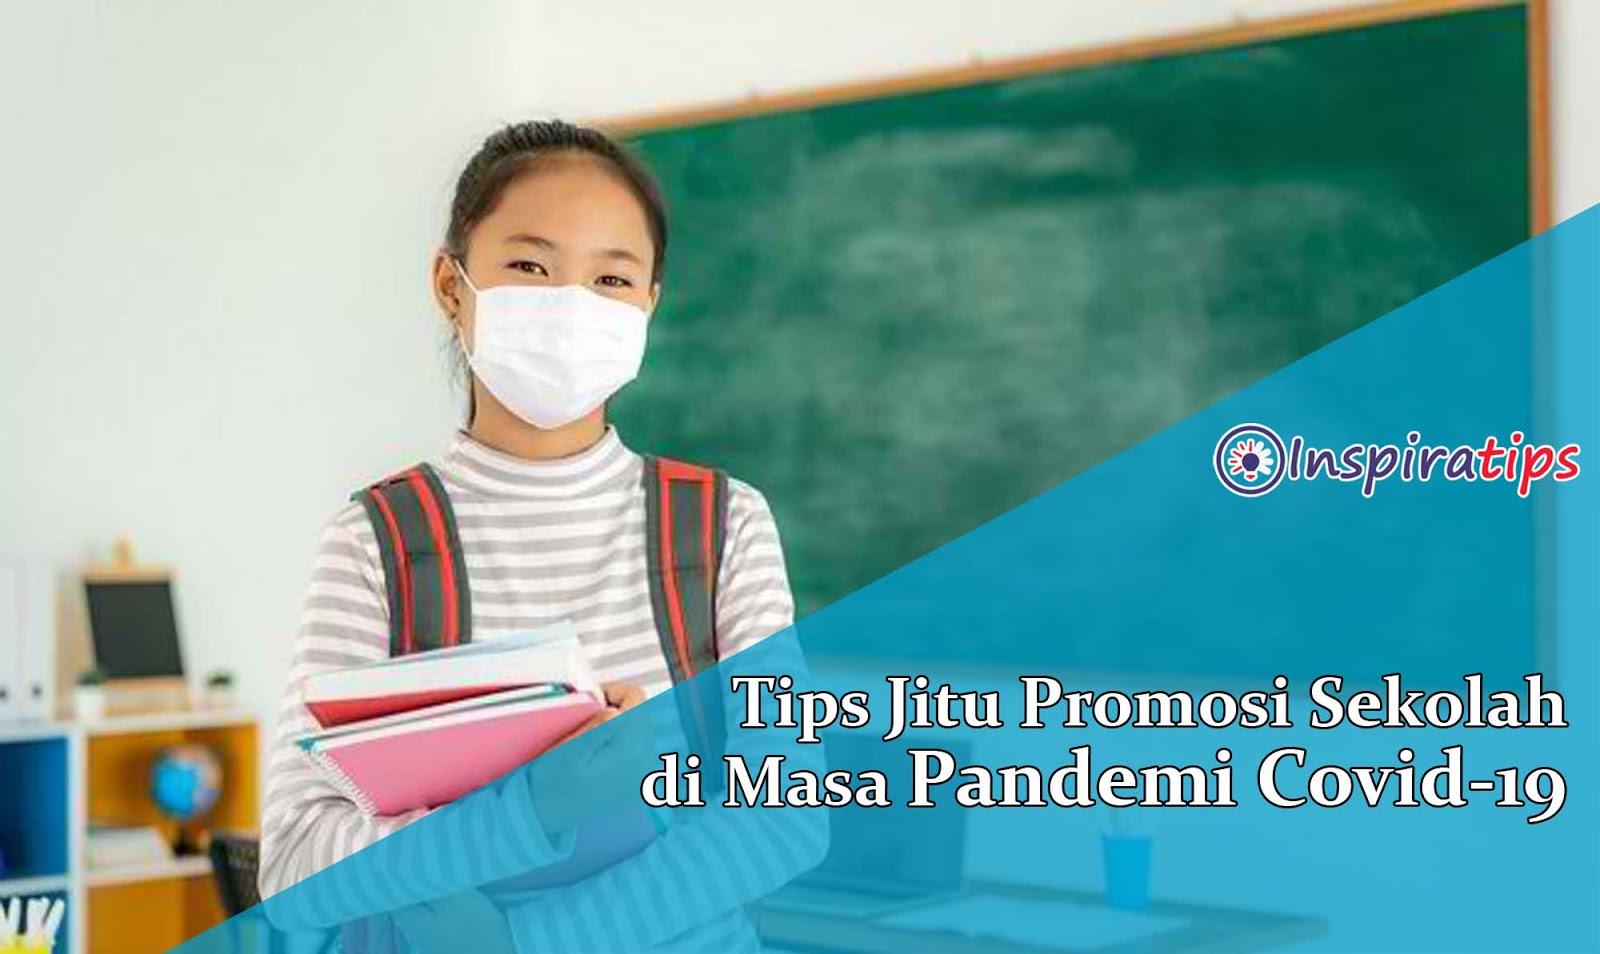 Cara Promosi Sekolah di Masa Pandemi